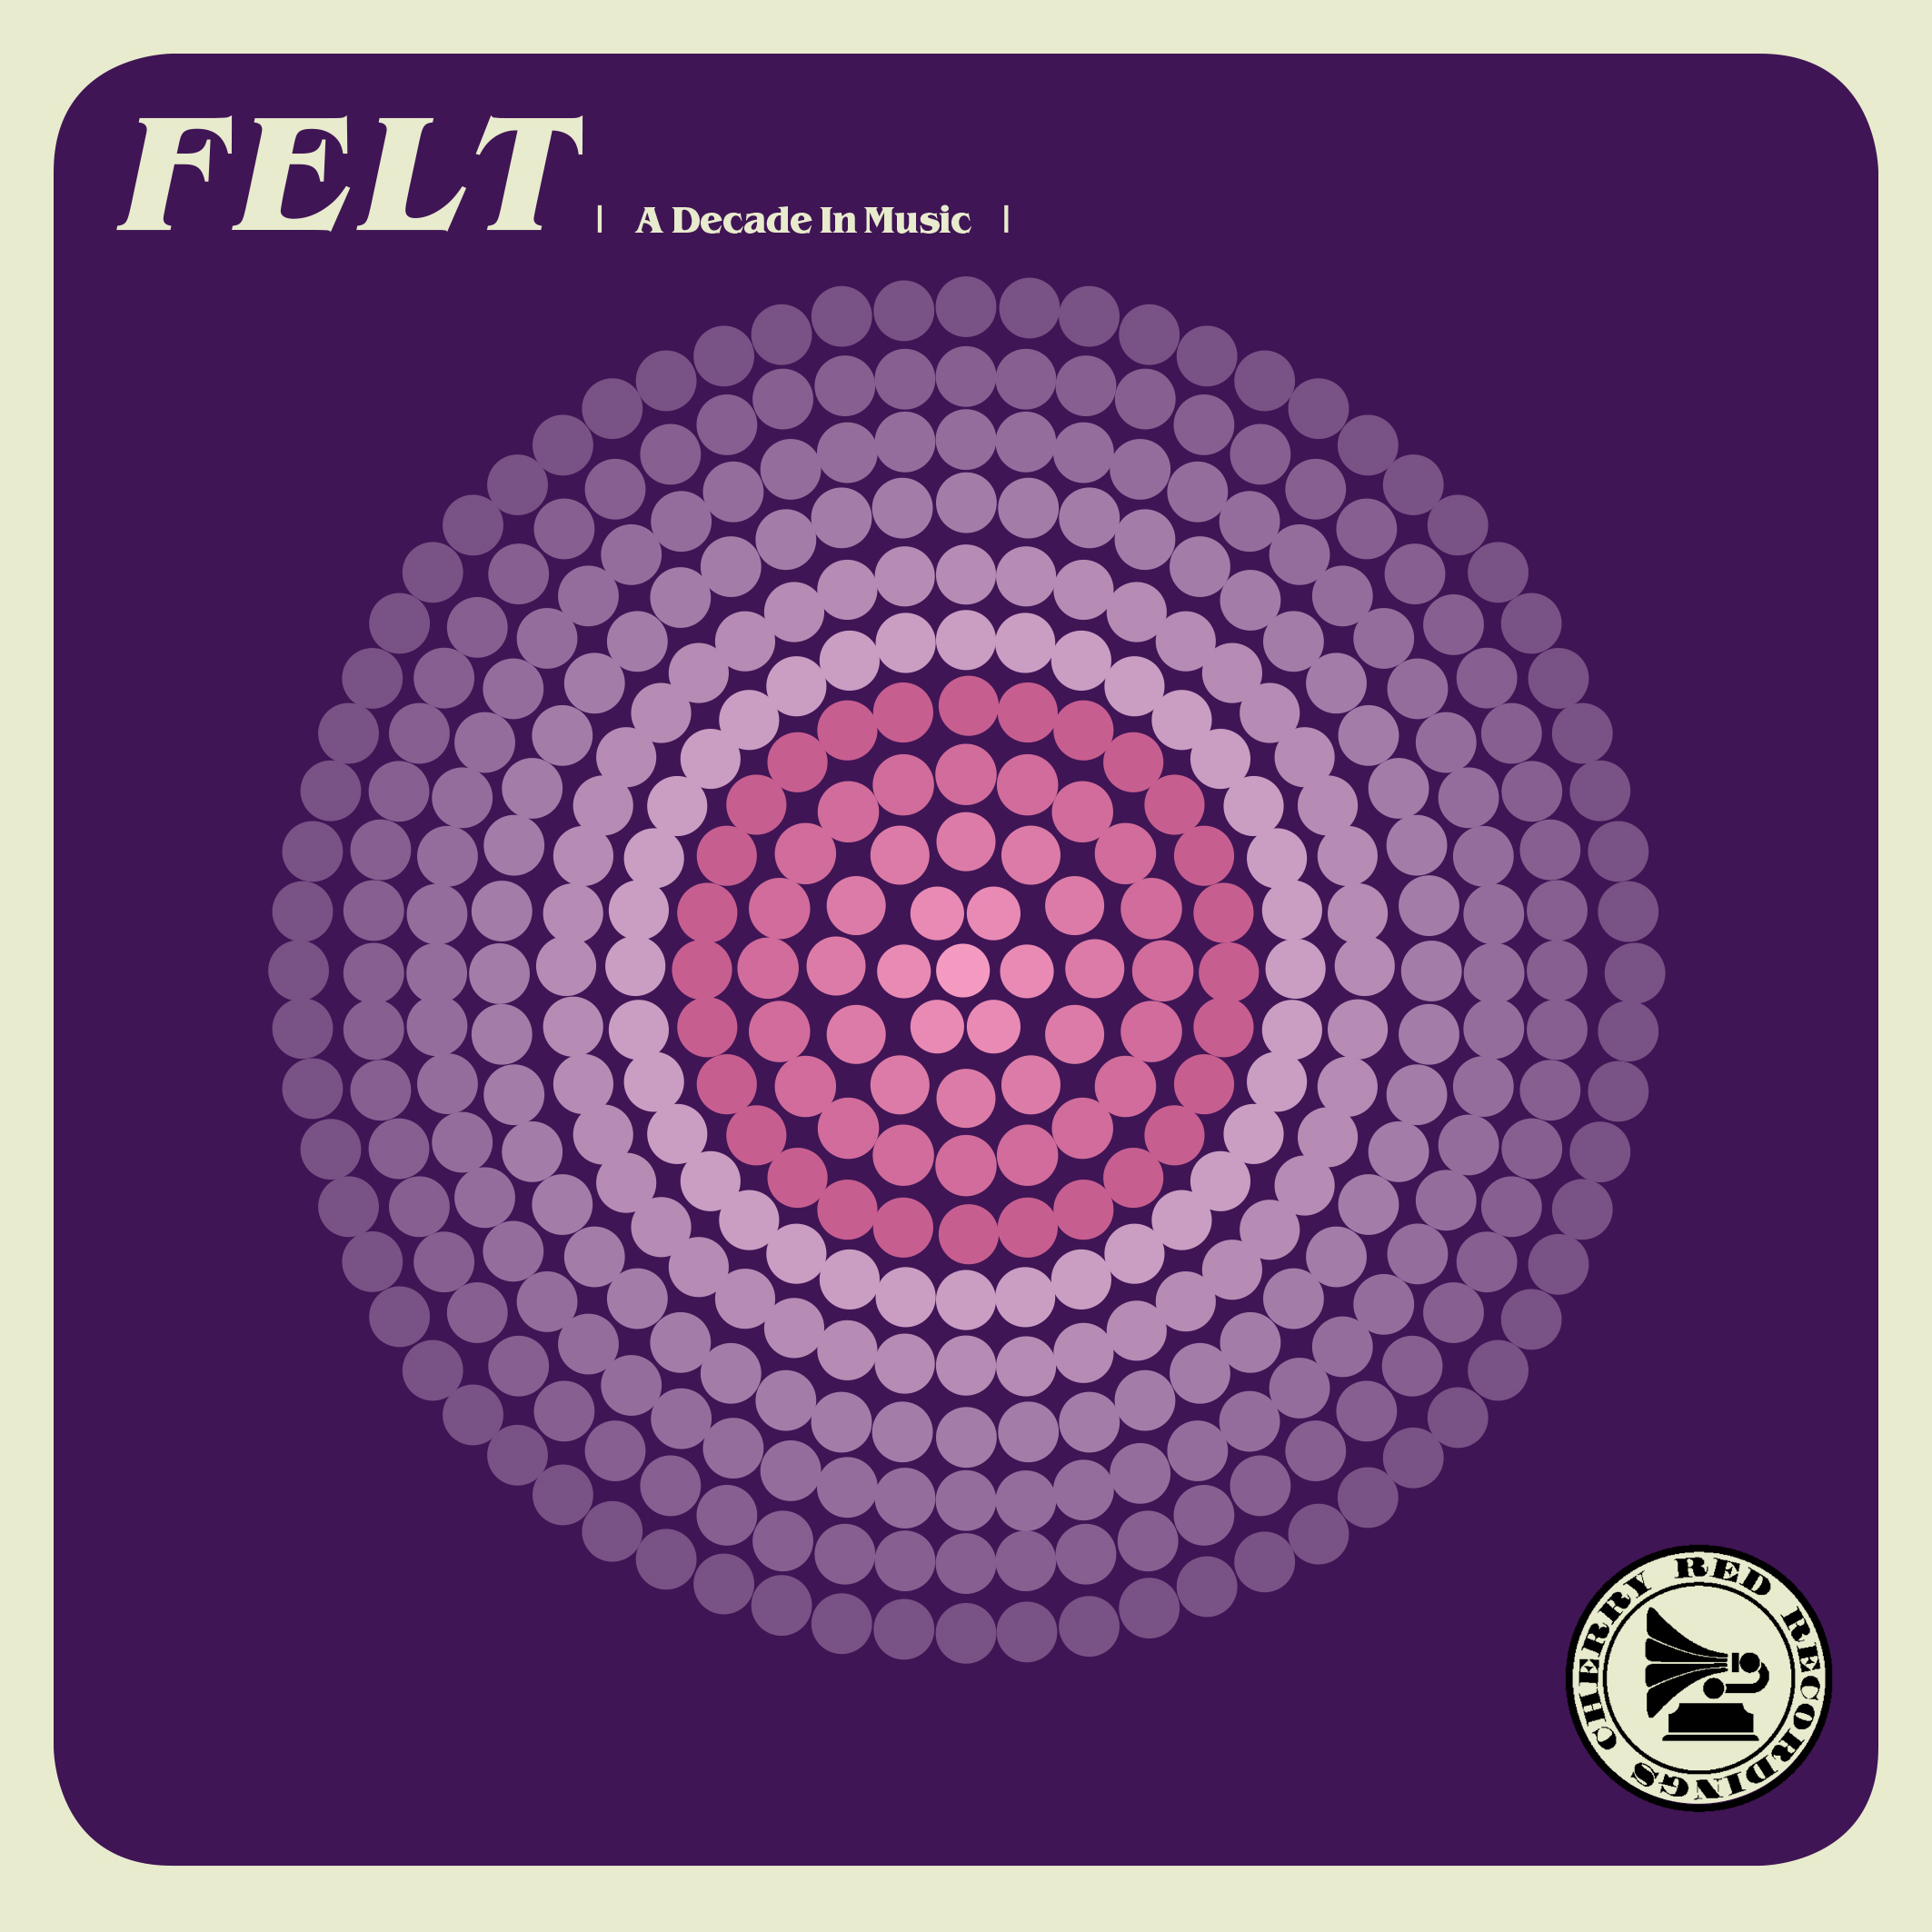 feltbox